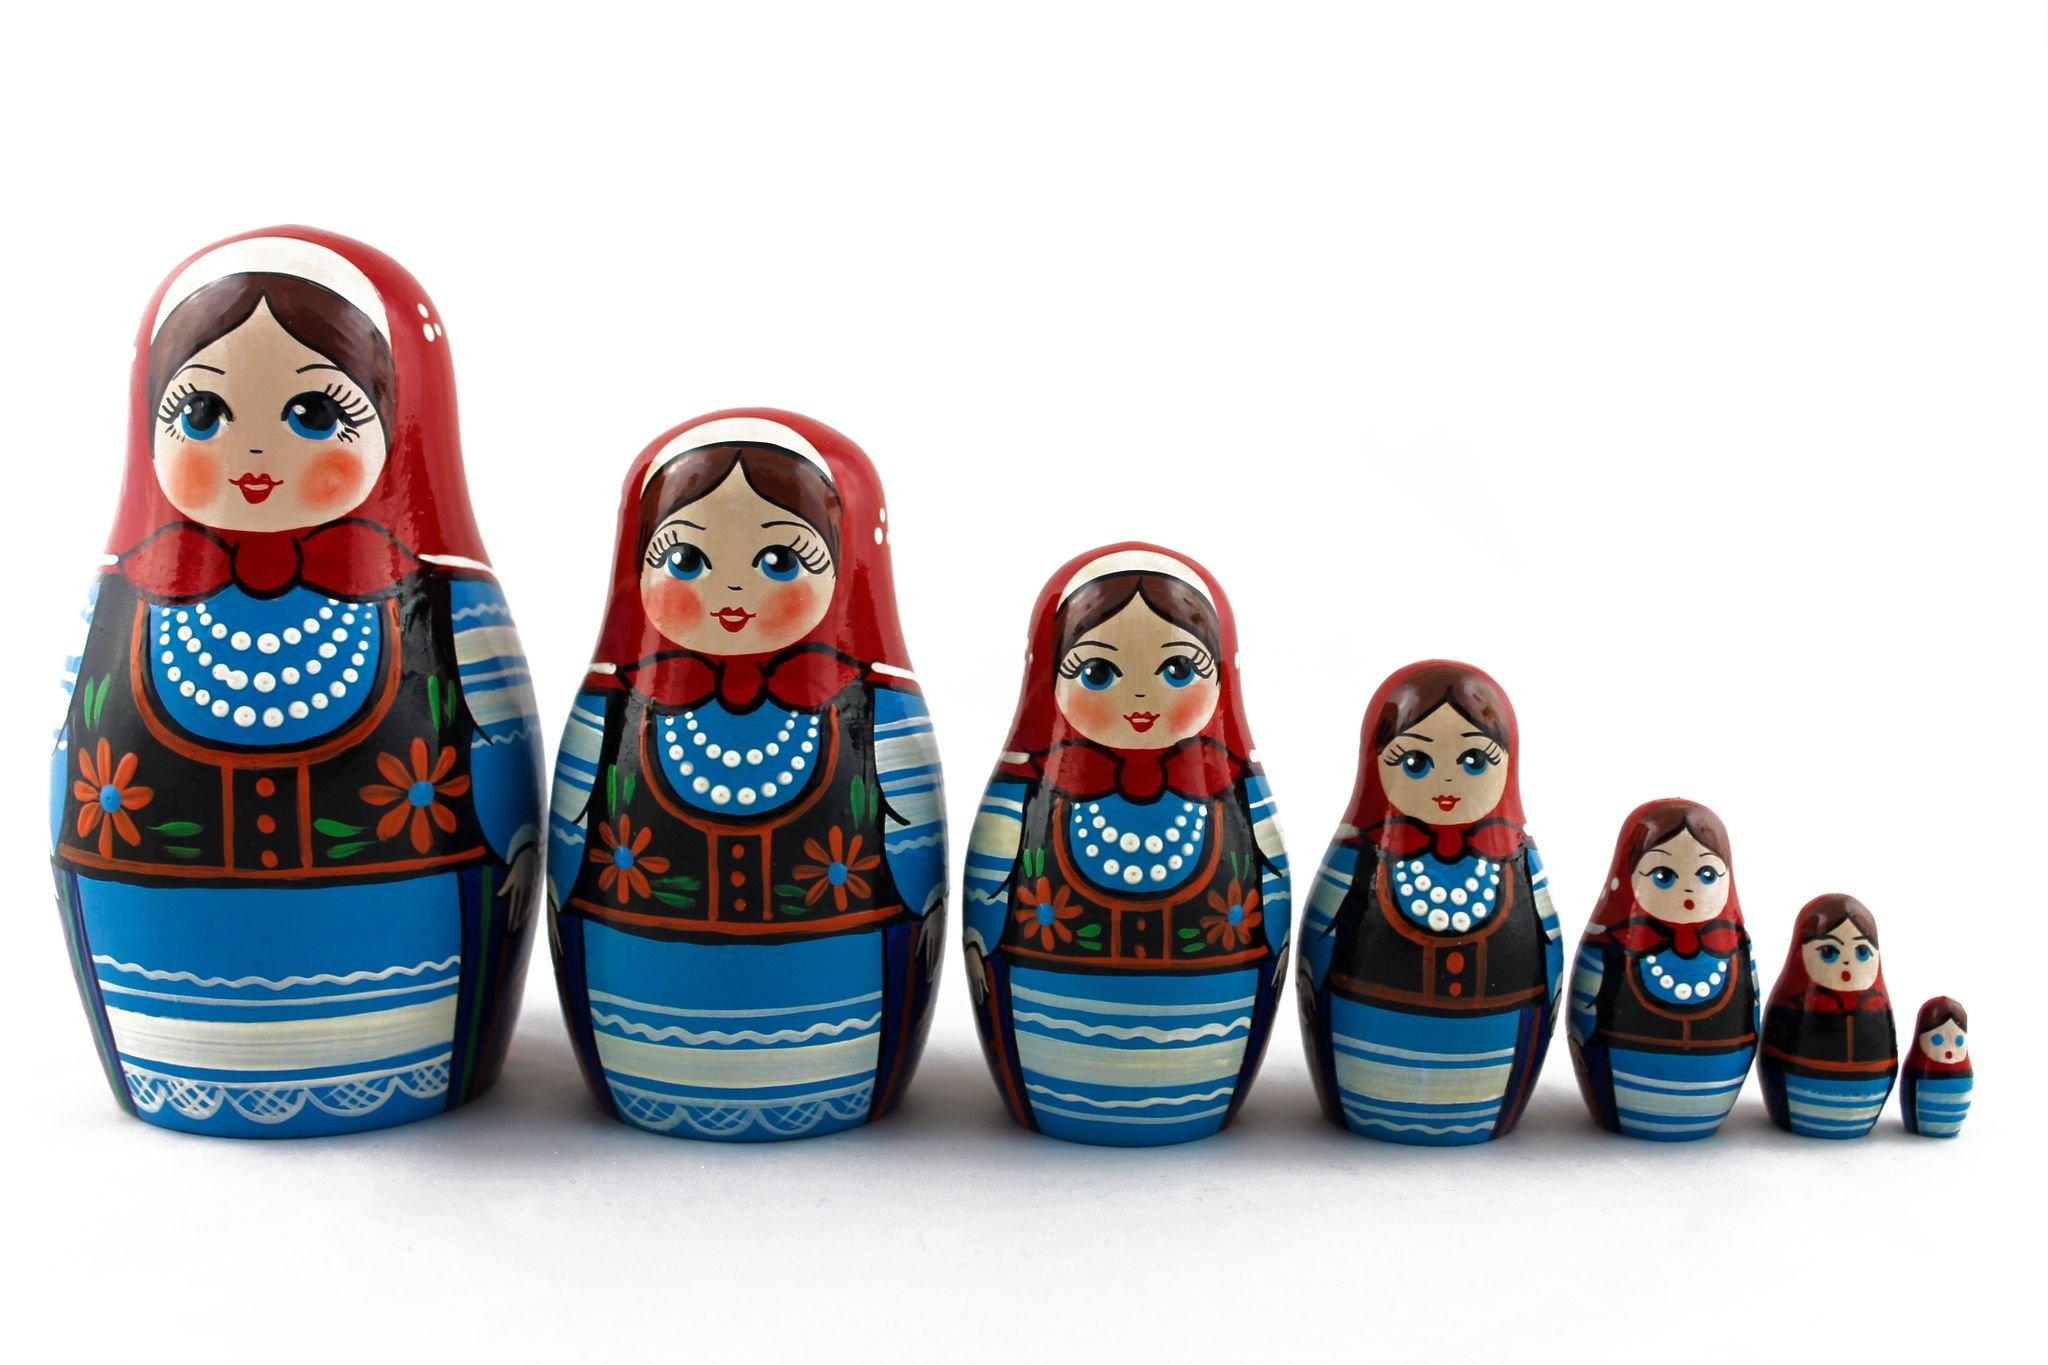 Matryoshka Polish National Dress Babushka Russian Nesting Wooden Stacking Doll 7 Pcs